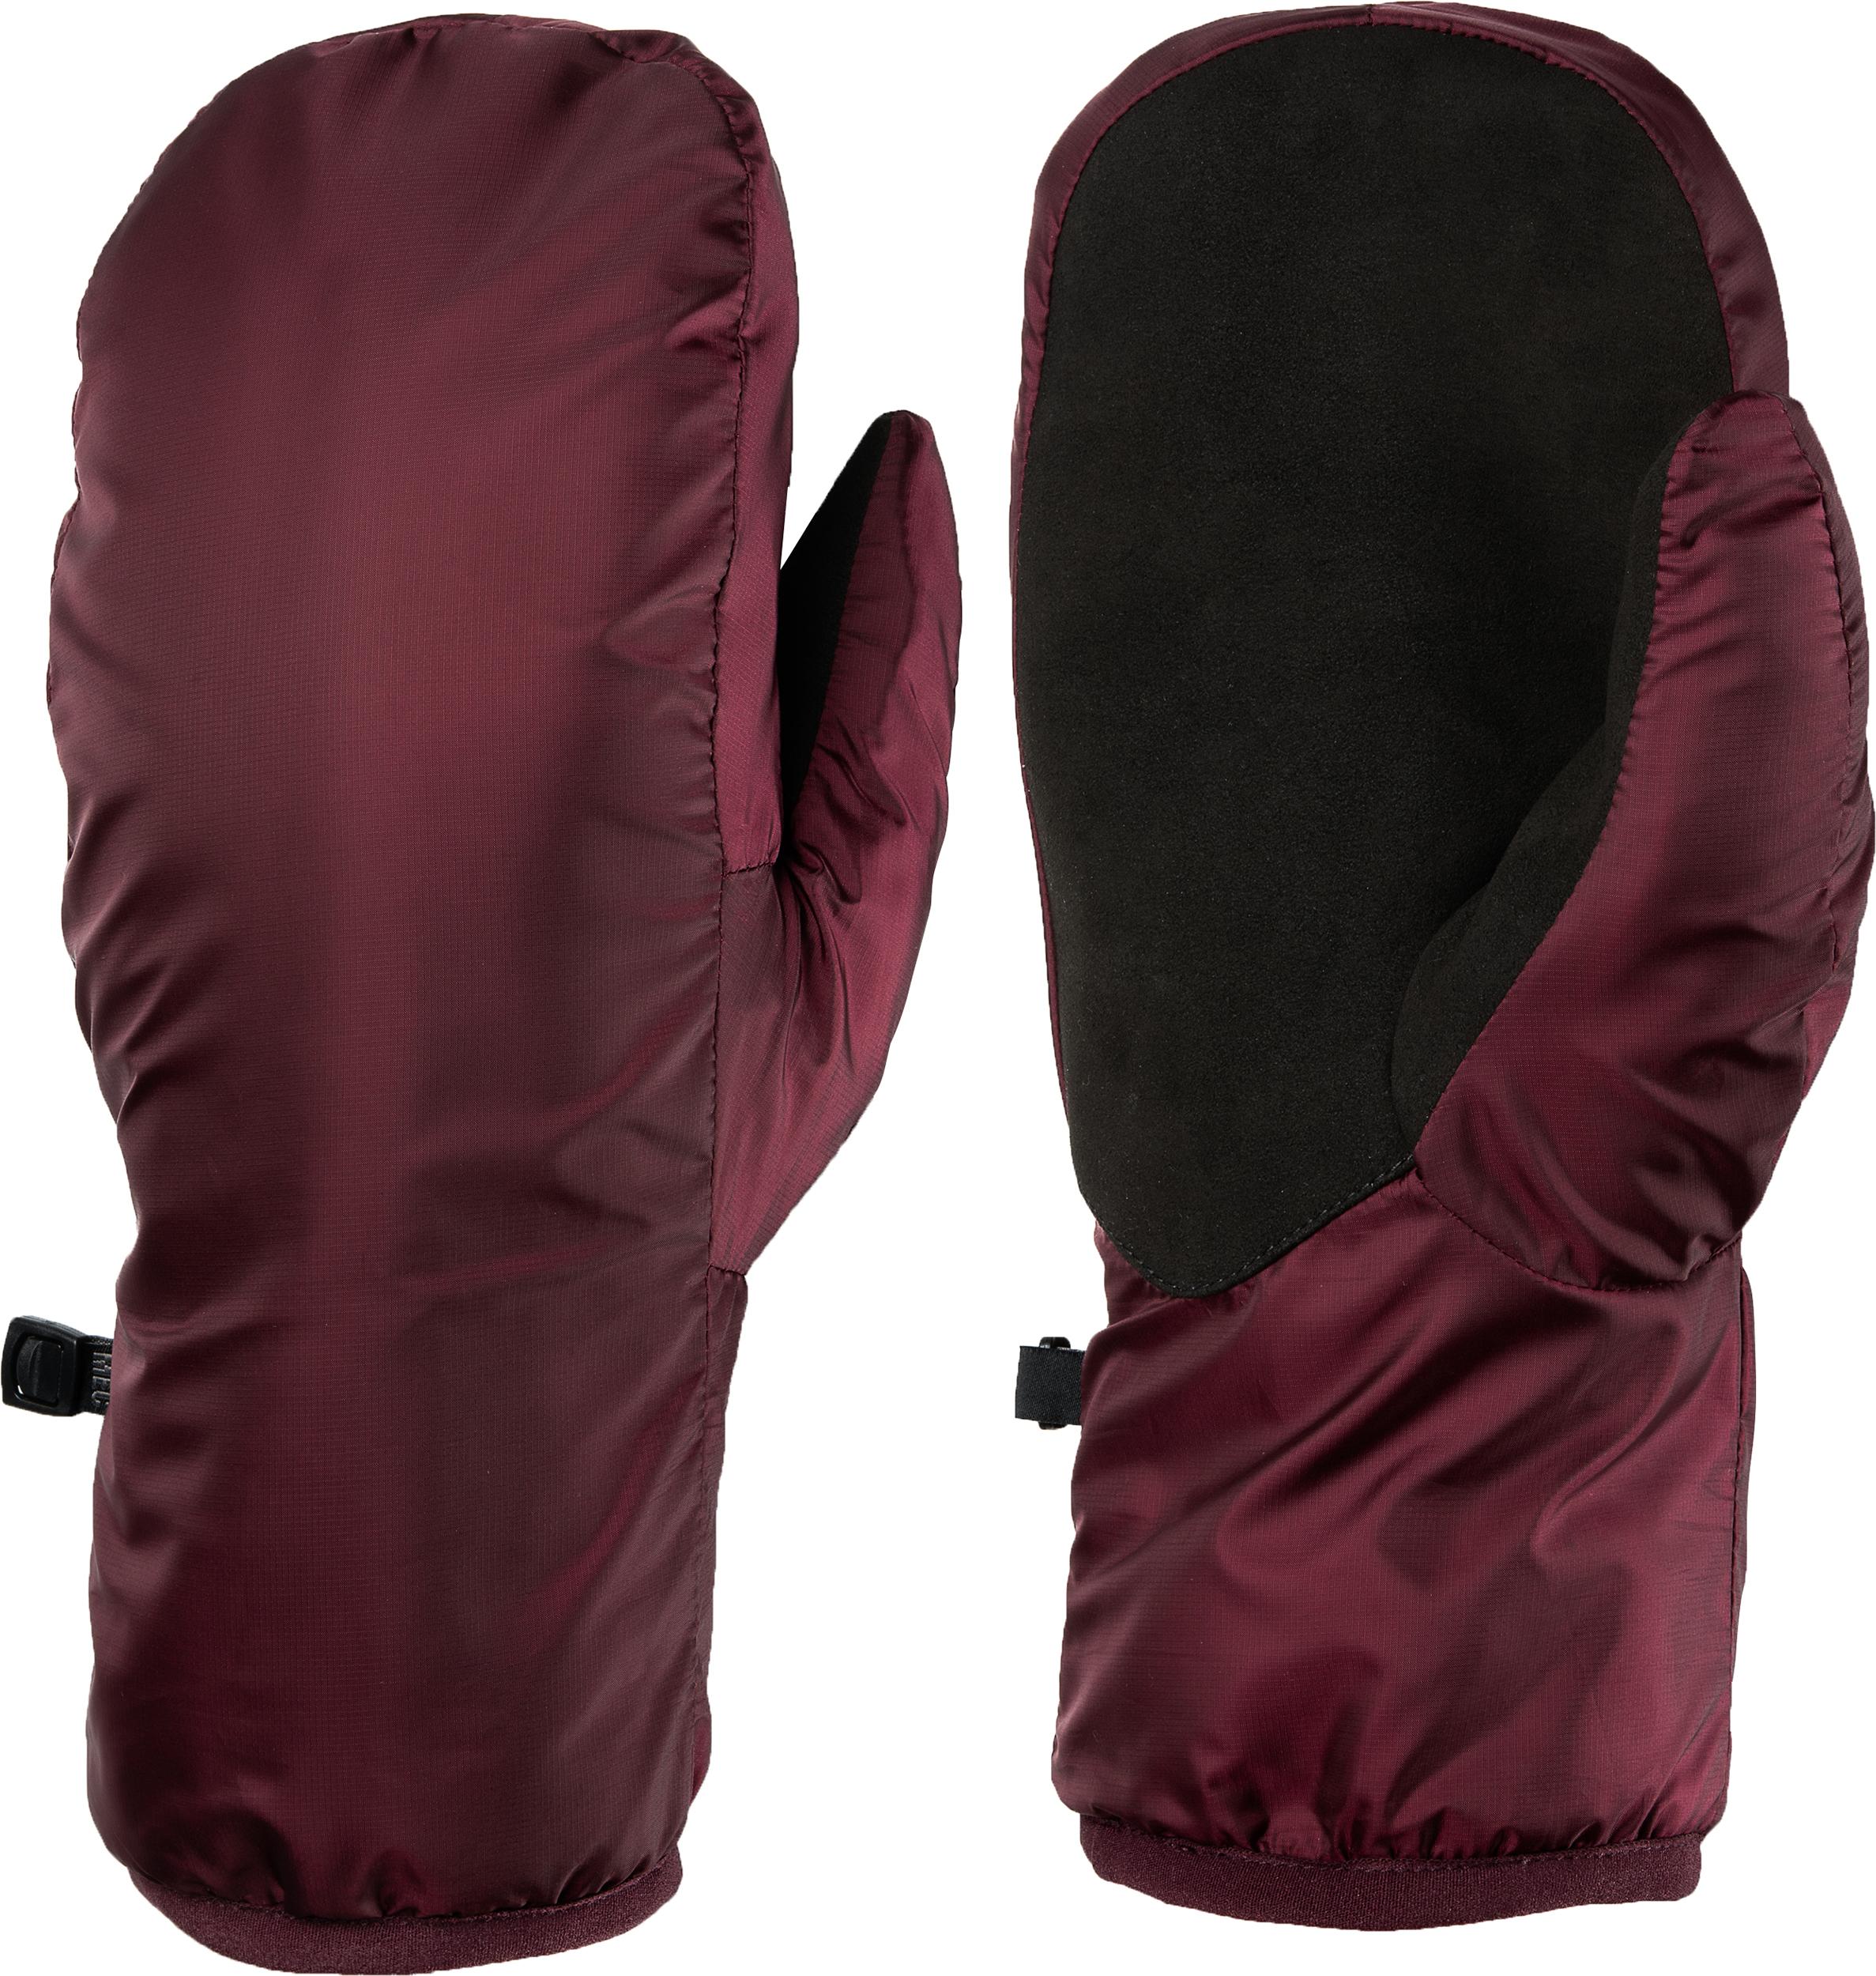 2a85d7937 Gloves and mittens | MEC